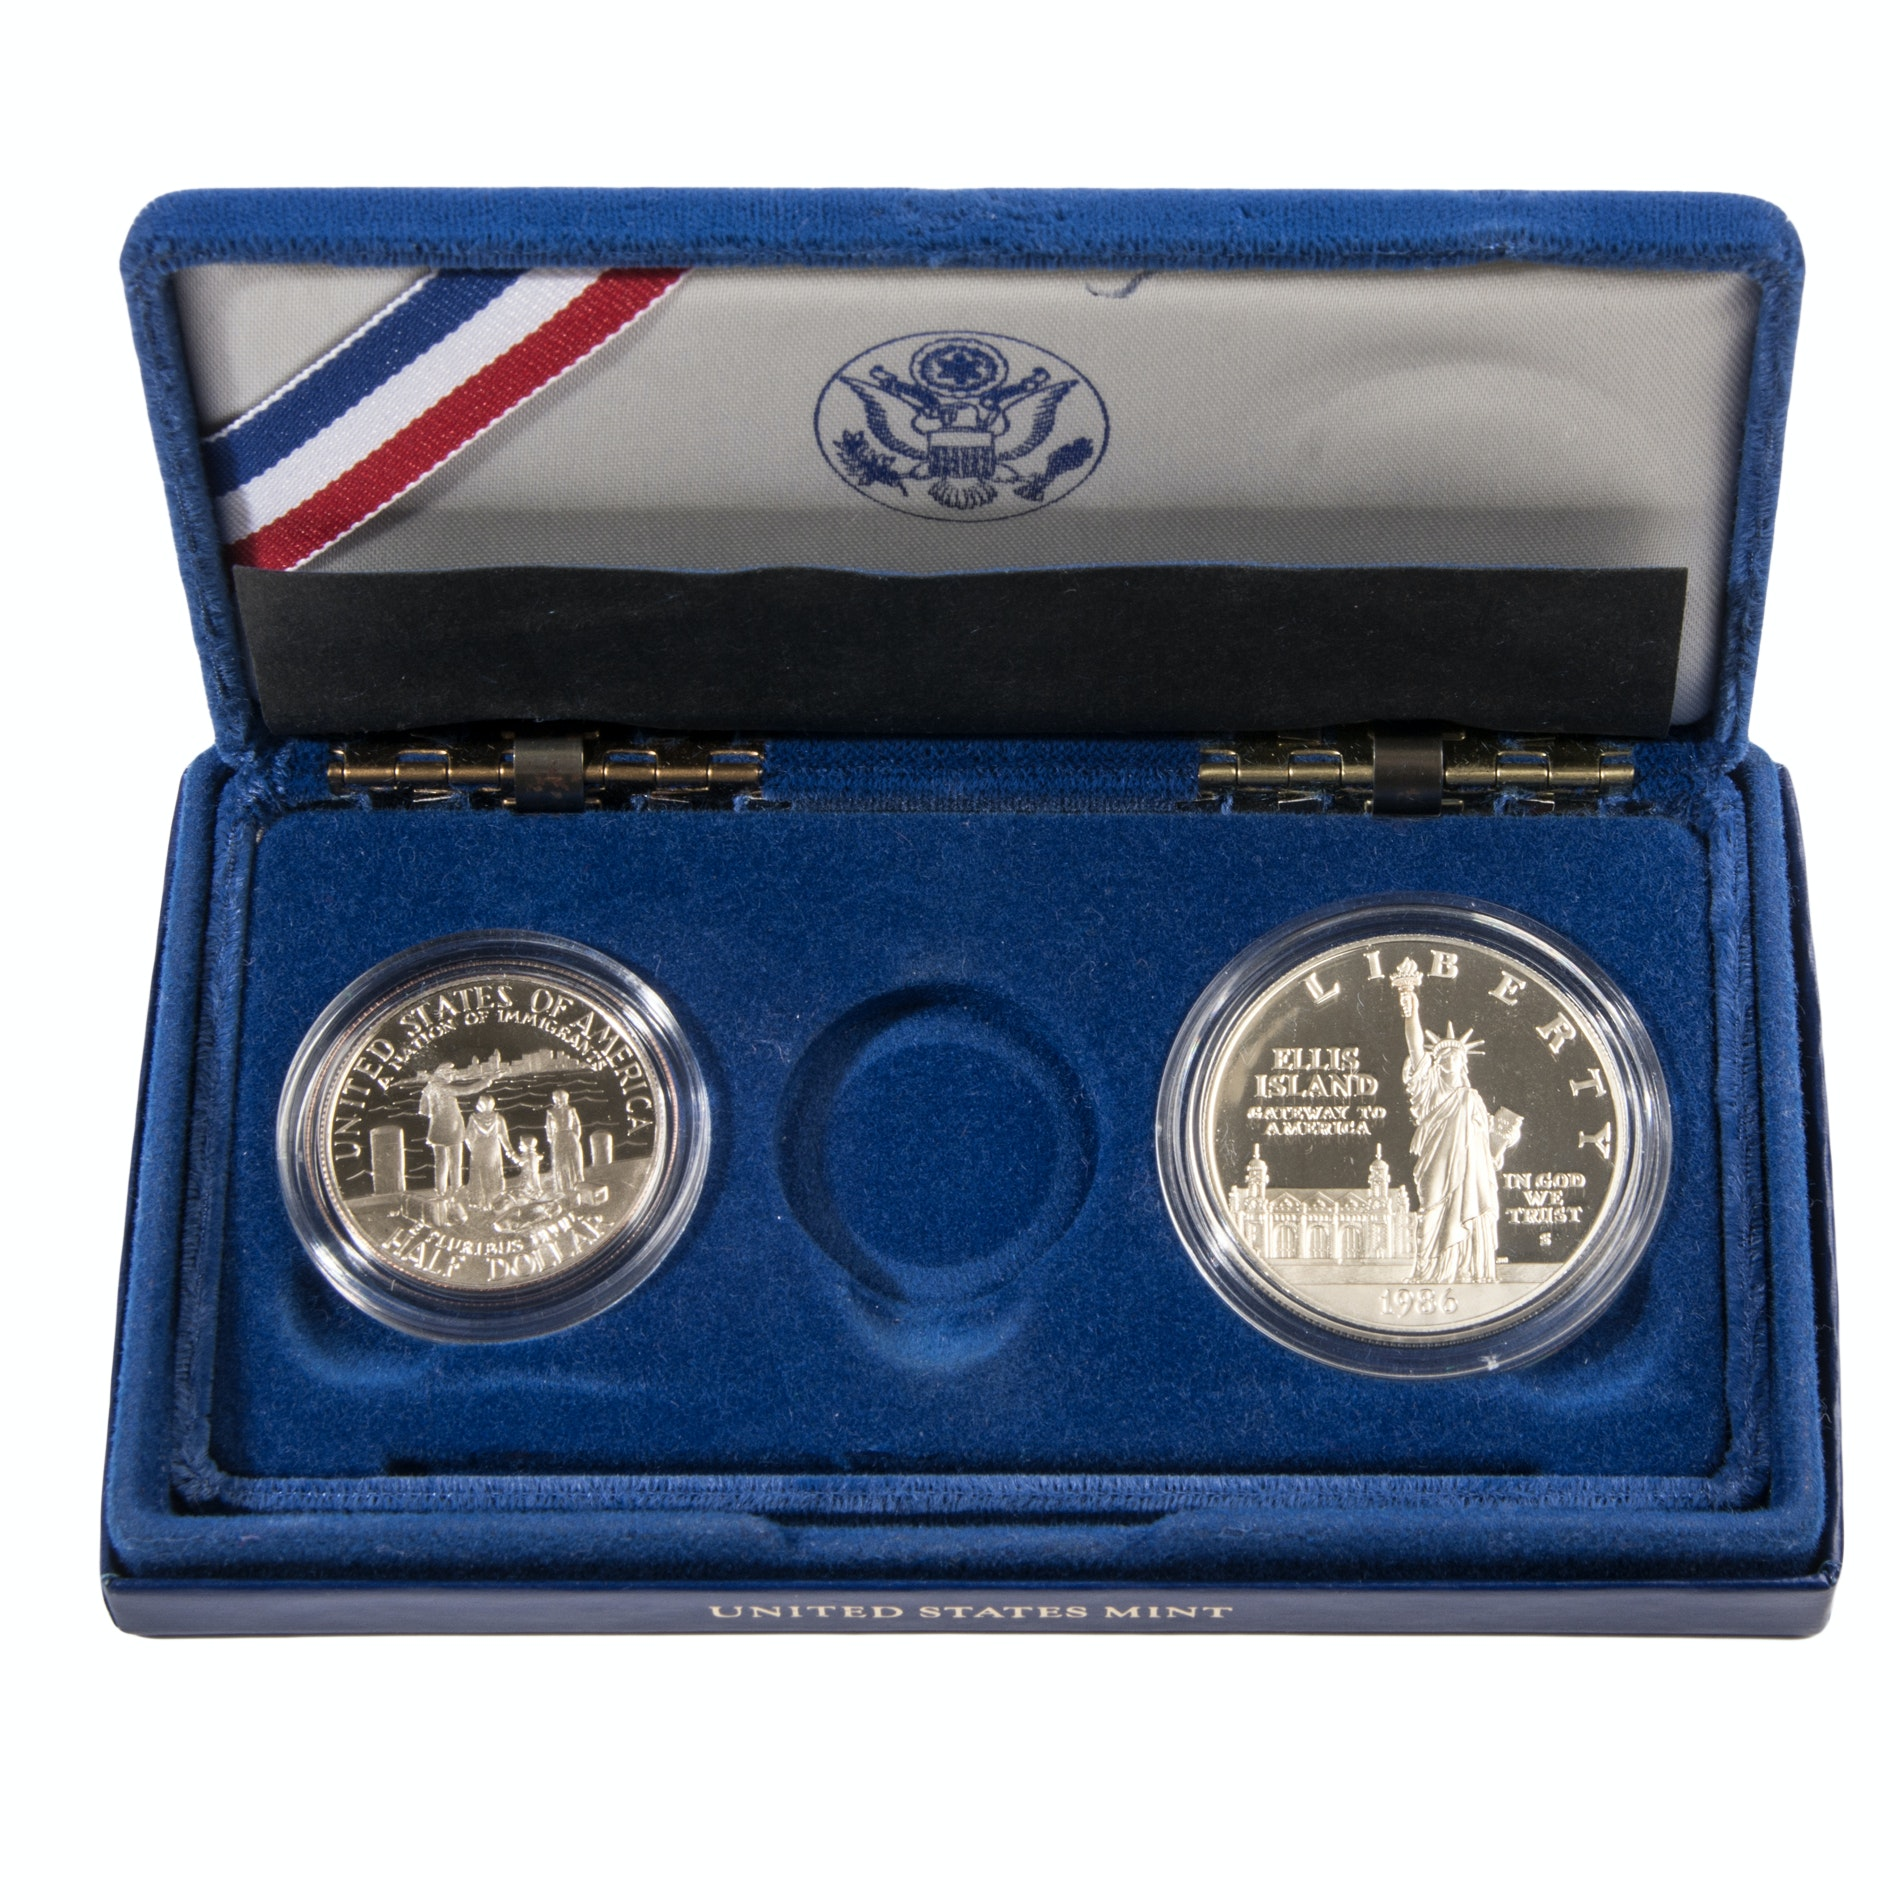 Commemorative 1986 Statue of Liberty Coins